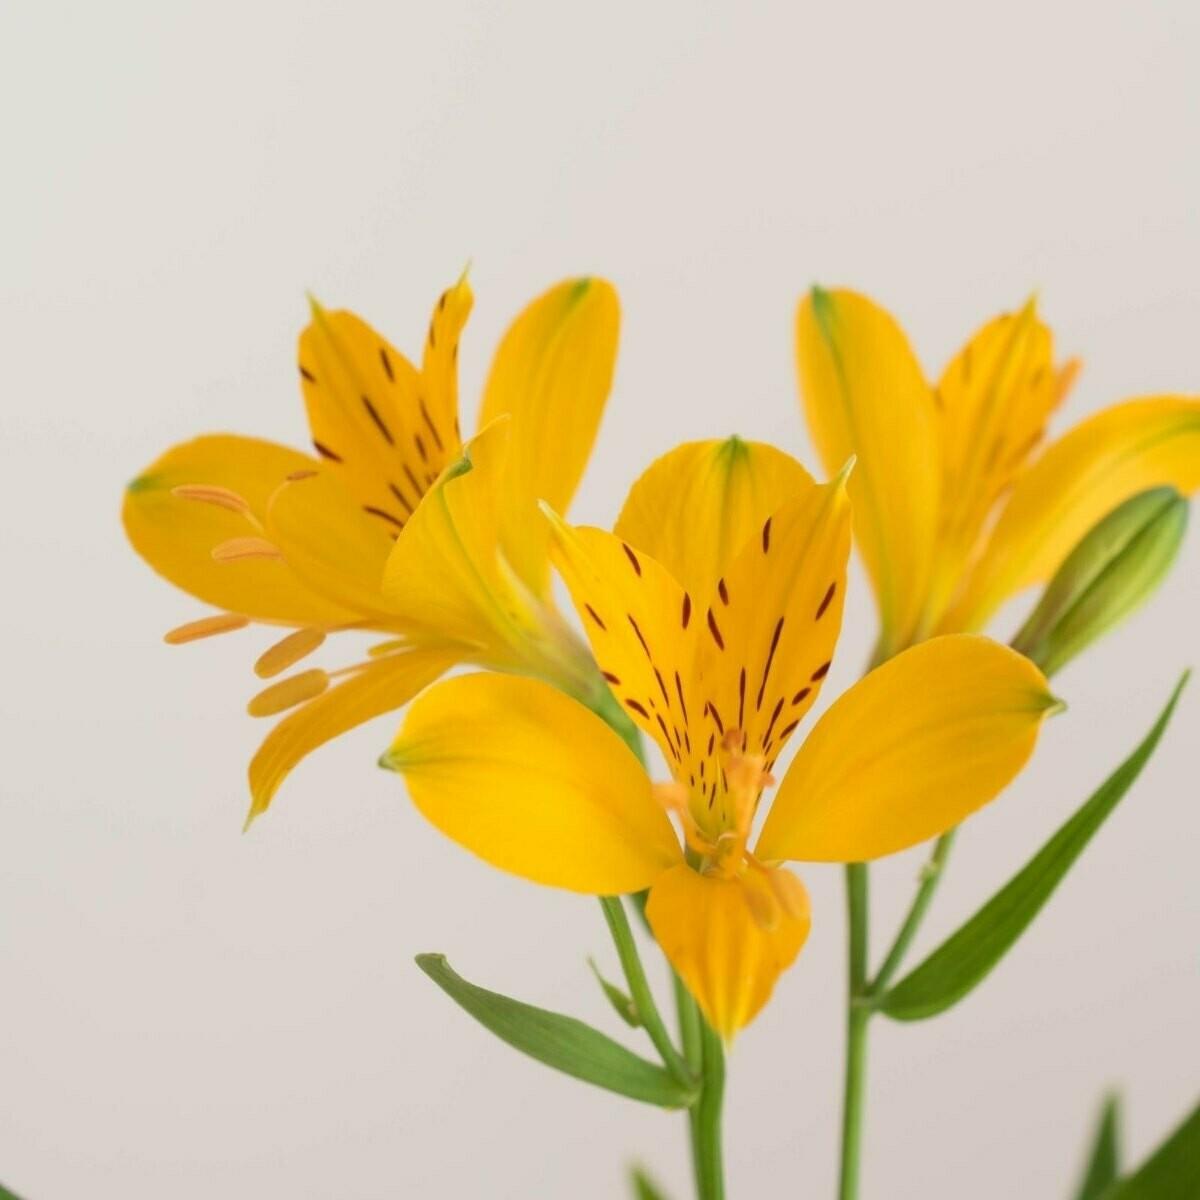 Anais - Alstroemeria Yellow